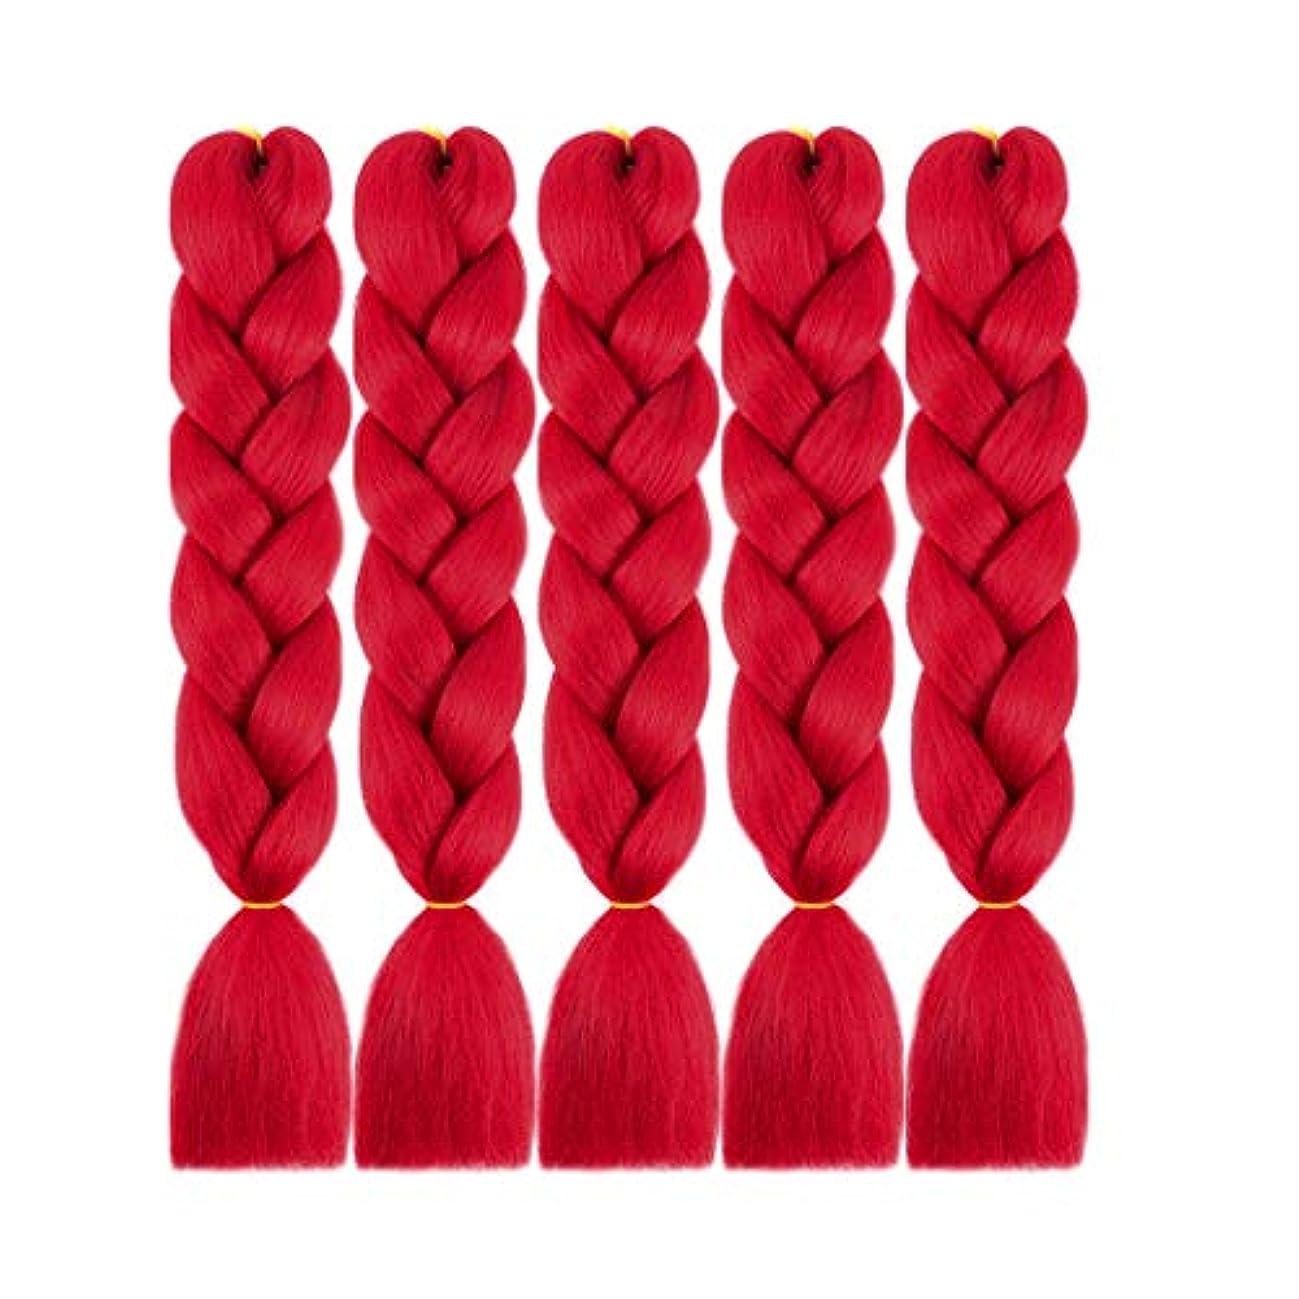 MSBELLE 5Pcs 24 Inch Kanekalon Braiding Hair Extensions Synthetic Braiding Hair Ombre Jumbo Braids Hair for Gilrs 100g/Pcs(Dark Red)